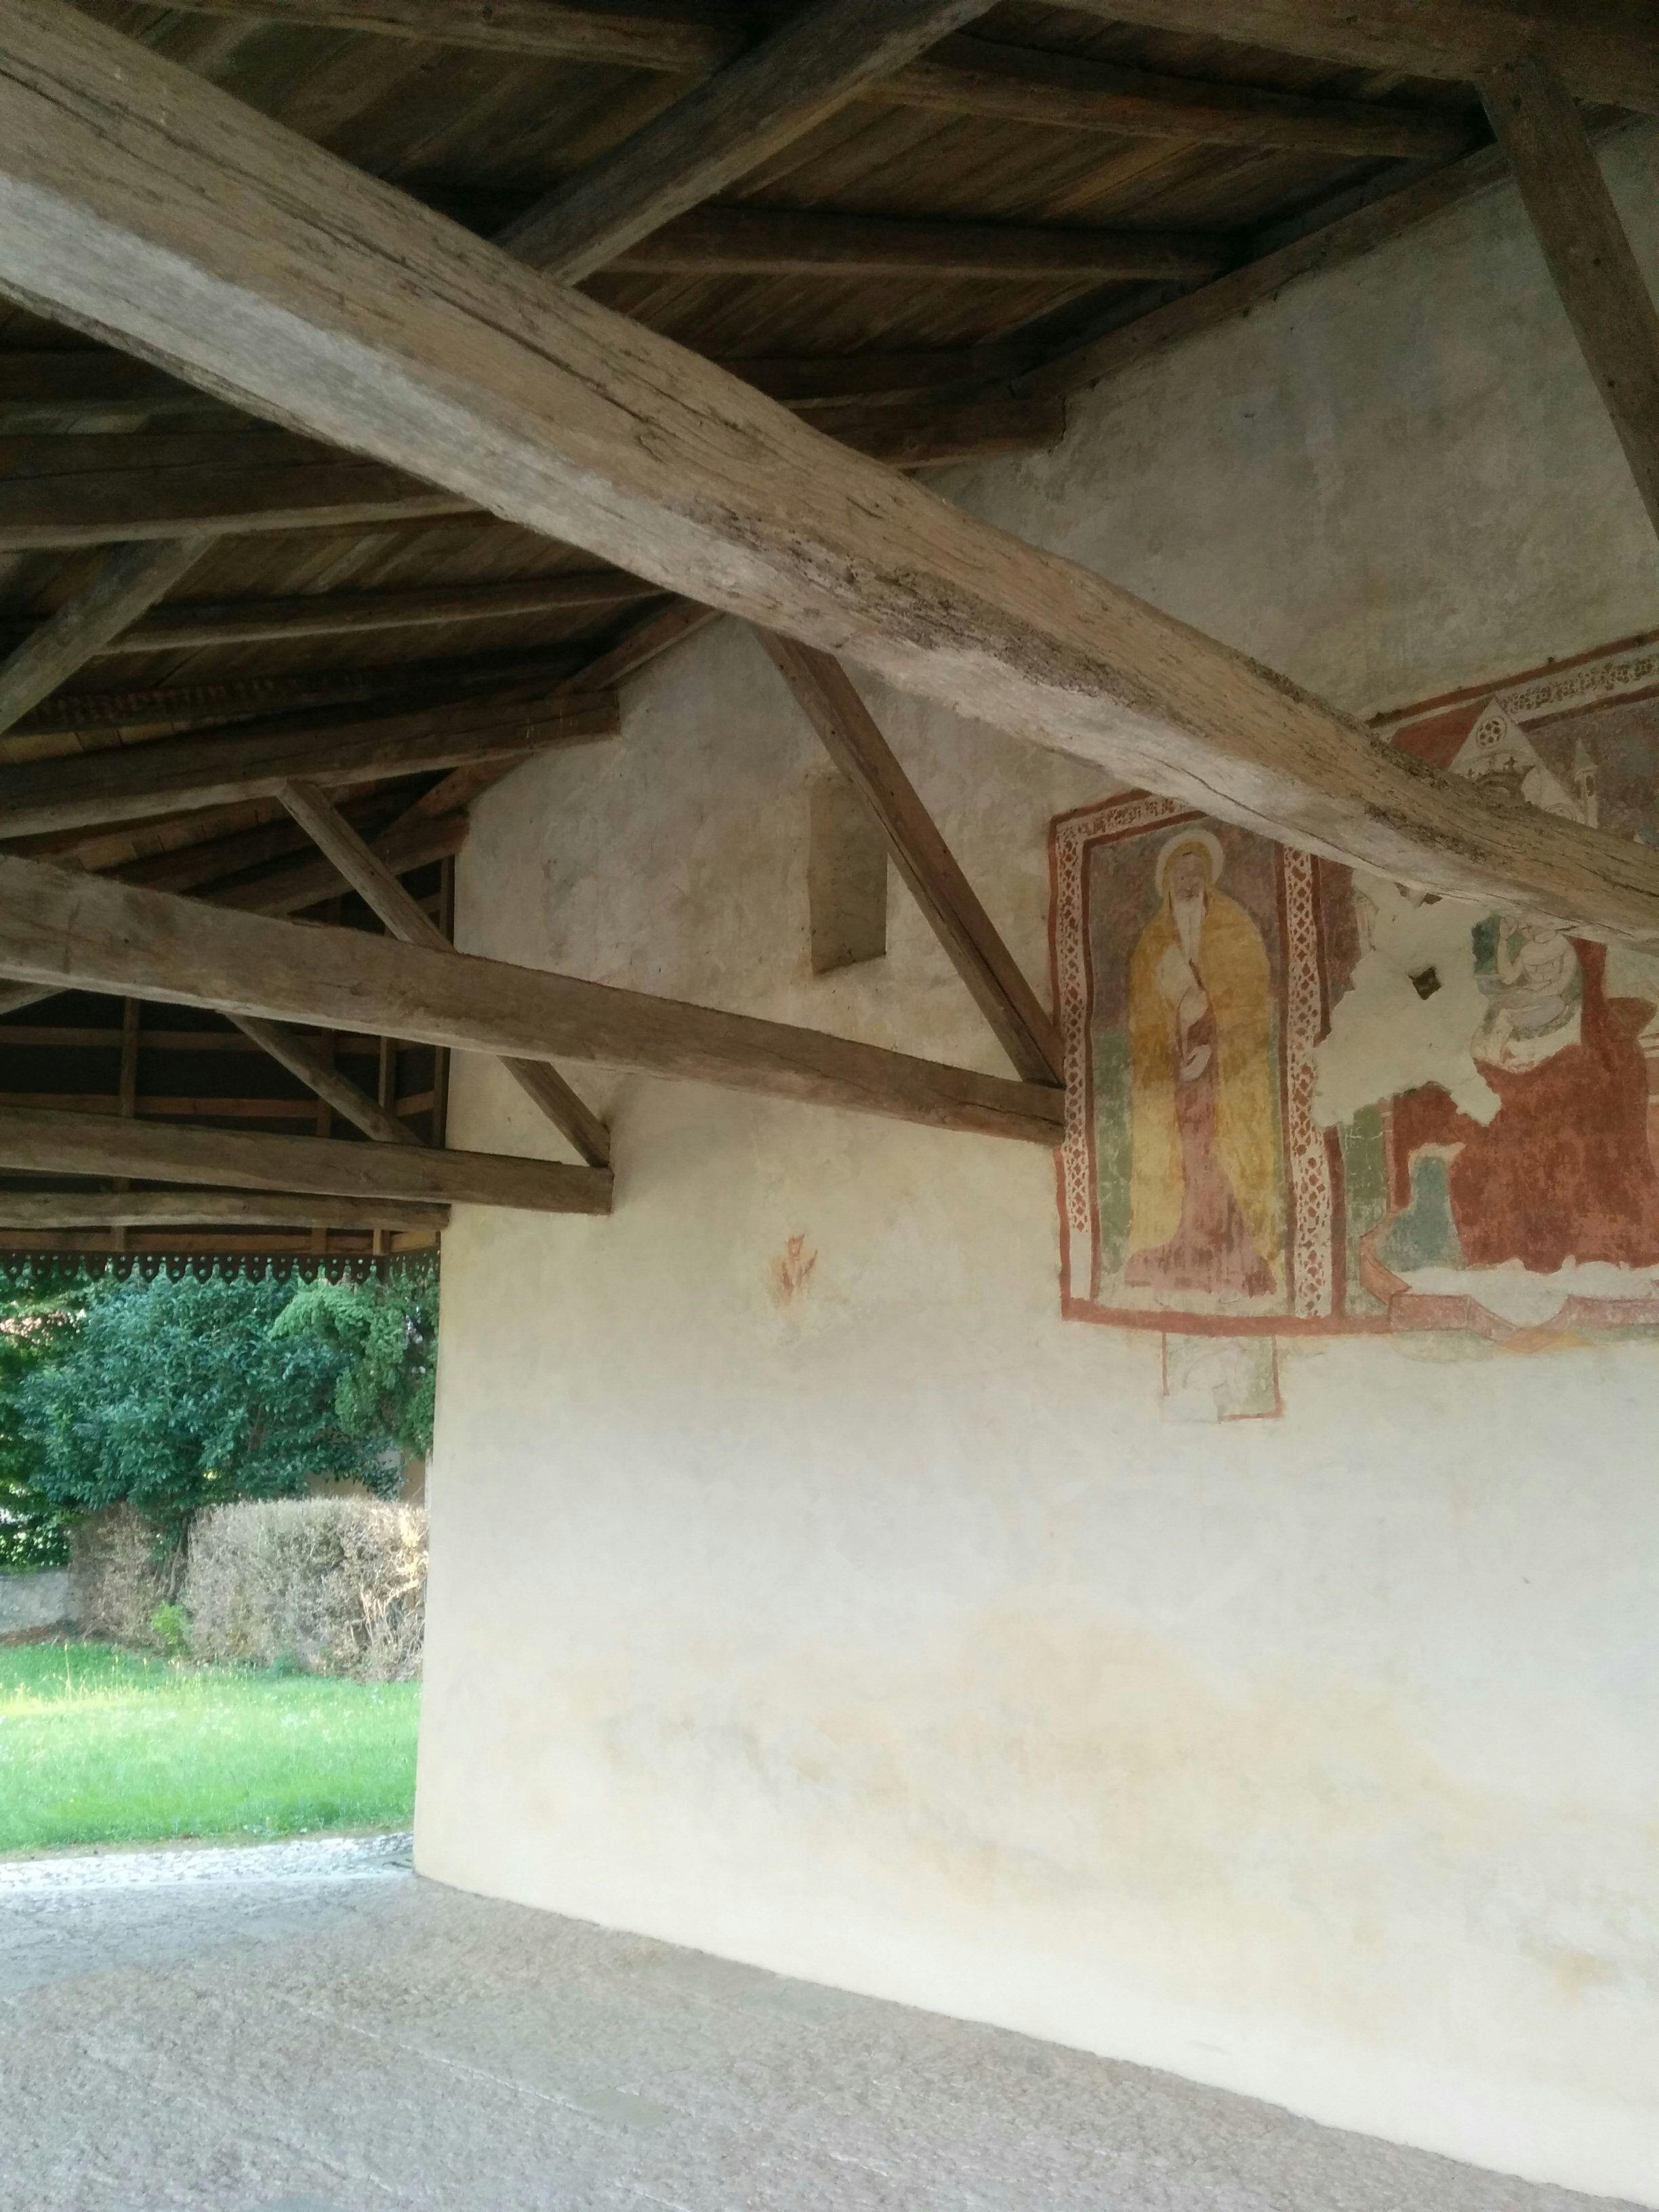 #Blogtour #Aifb #MarcaTrevisoinBianco #SanPietrodiFeletto #Pieve #Church